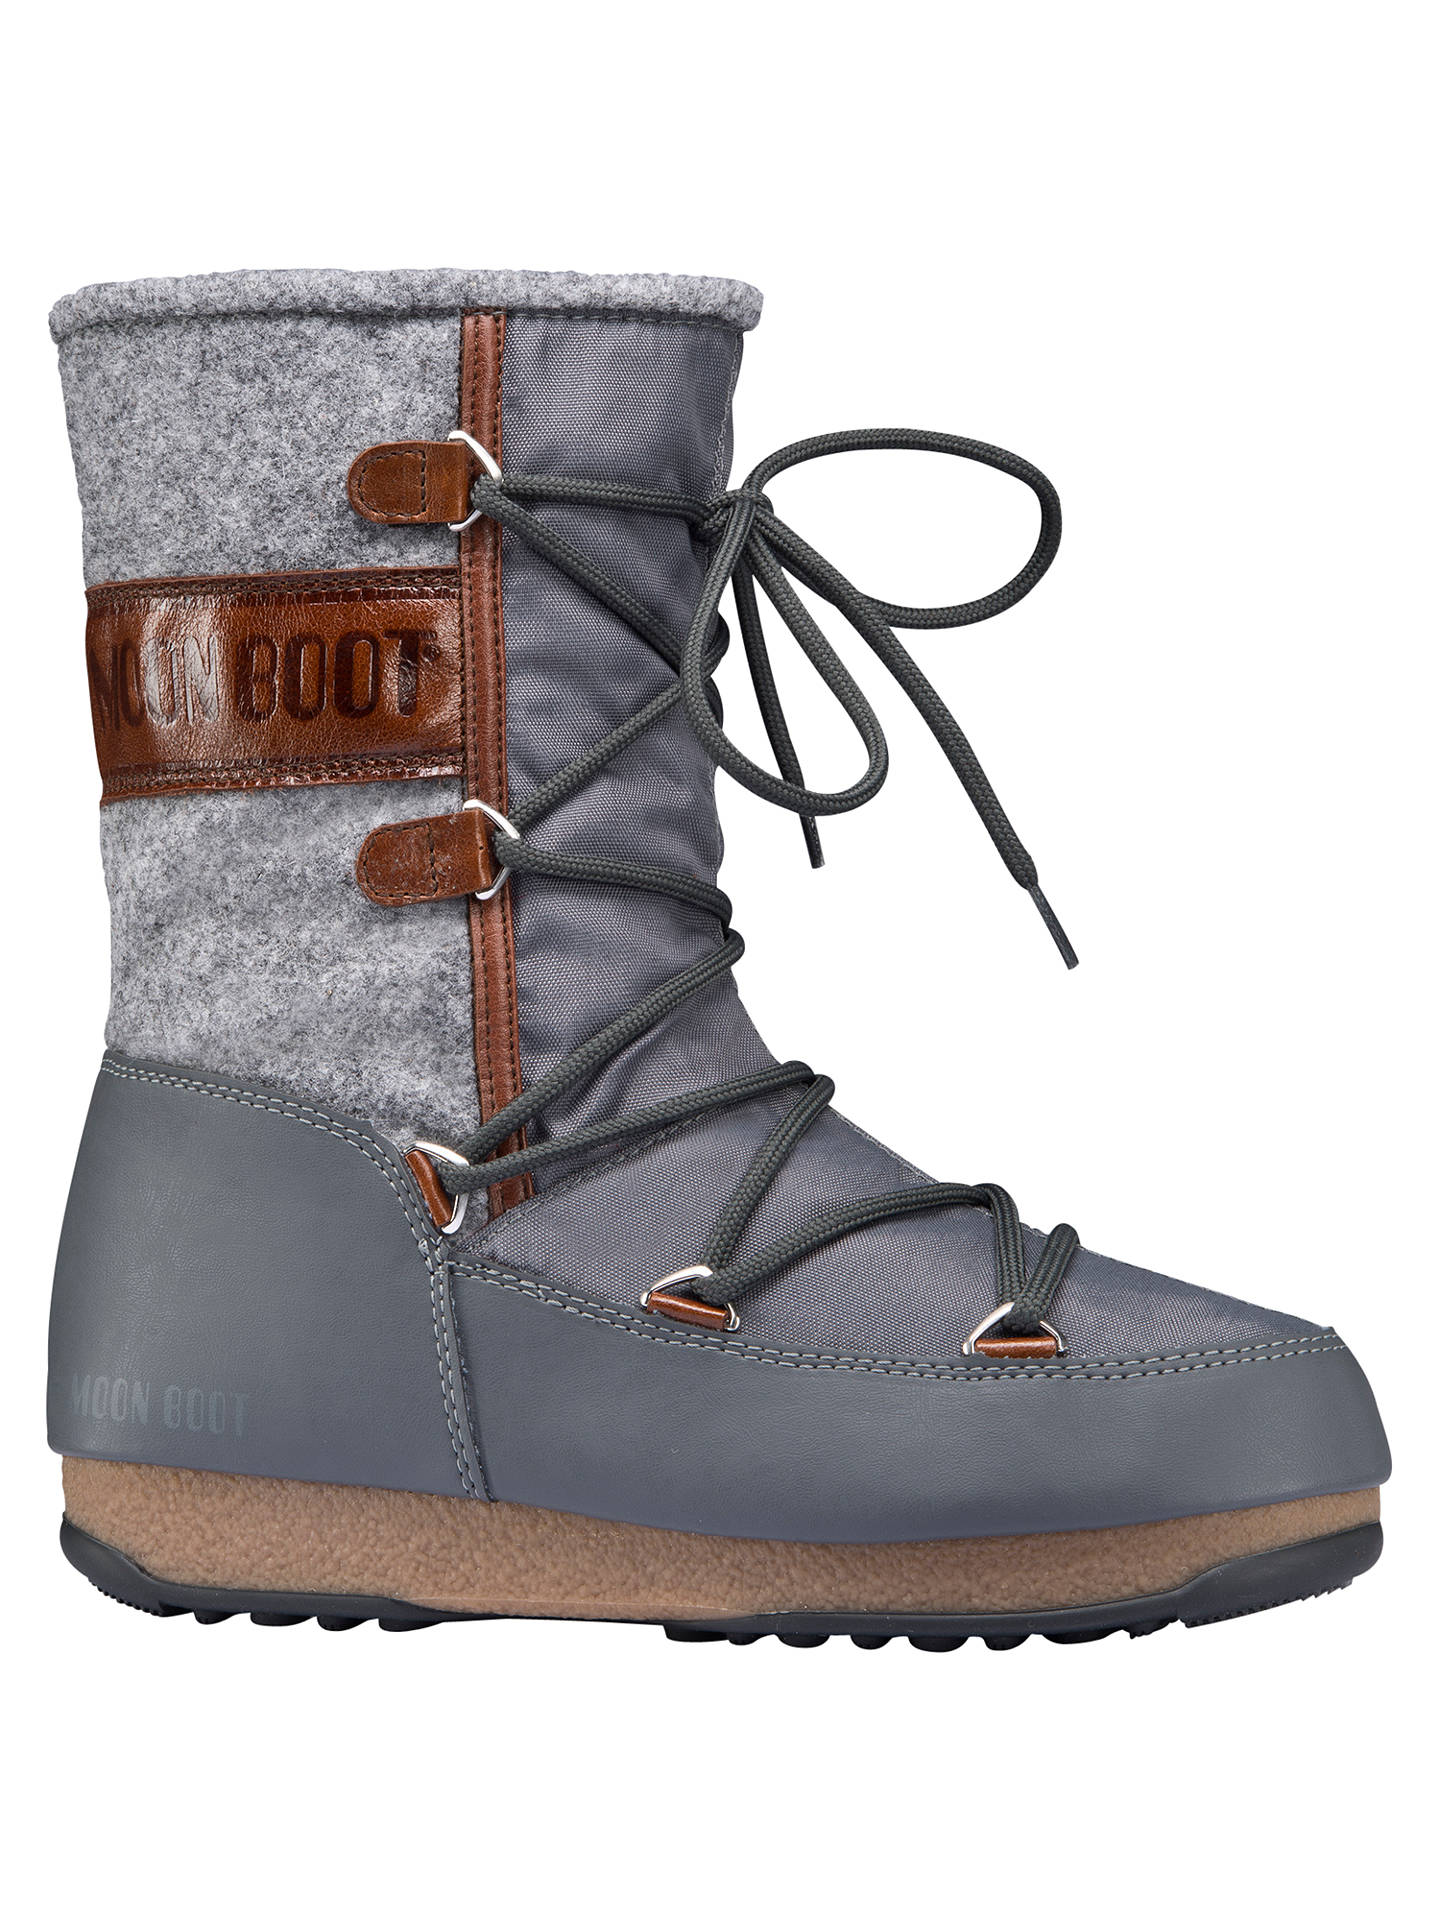 brand new 52b70 eeb8b Moon Boot Vienna Flat Calf Boots, Grey at John Lewis & Partners